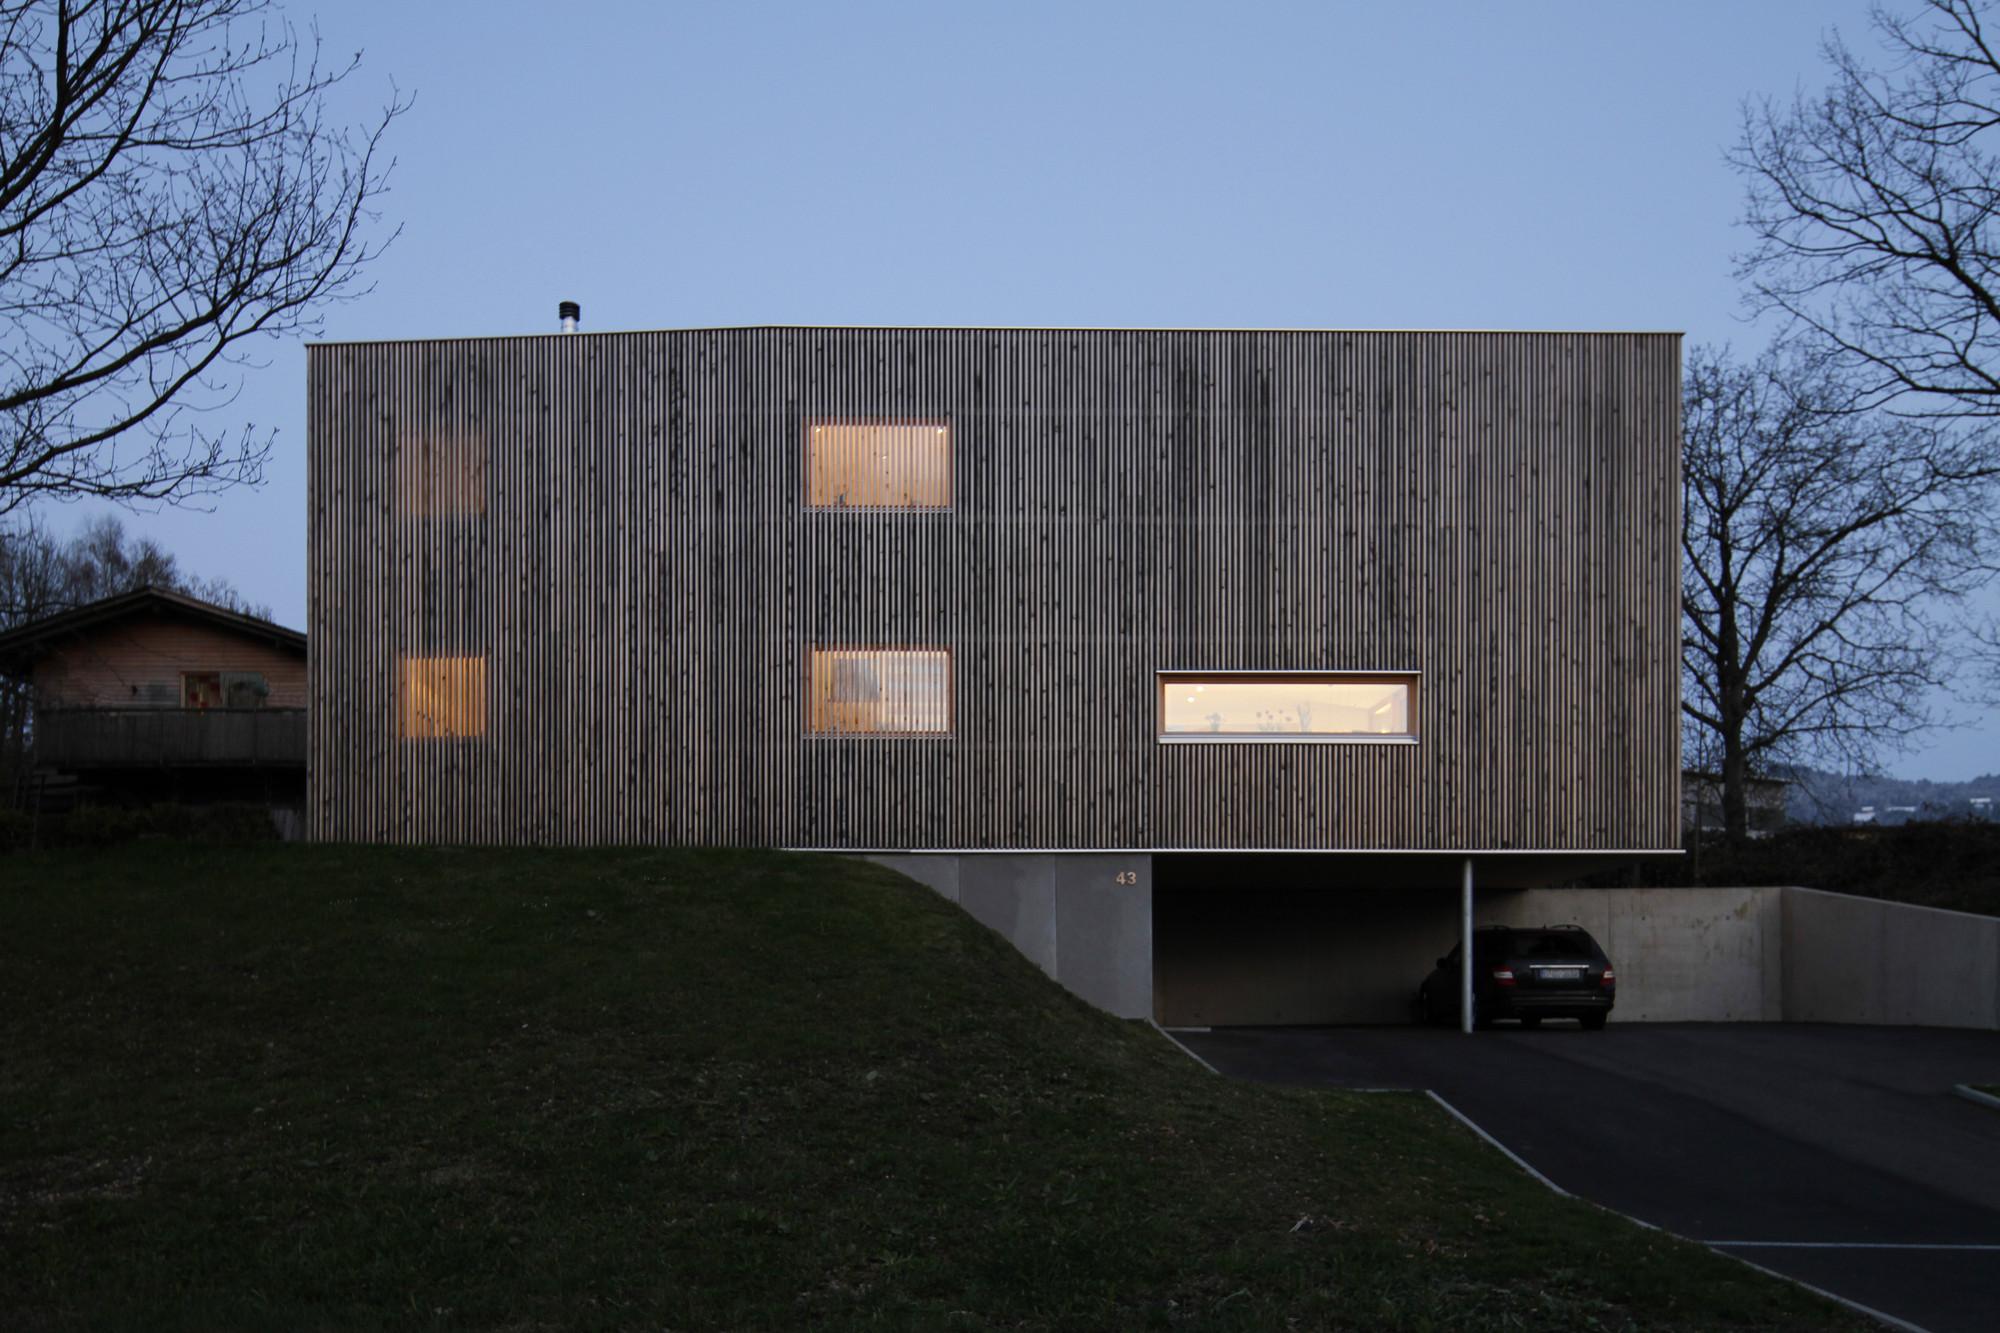 House J-T / Juri Troy Architects, Courtesy of Juri Troy Architects